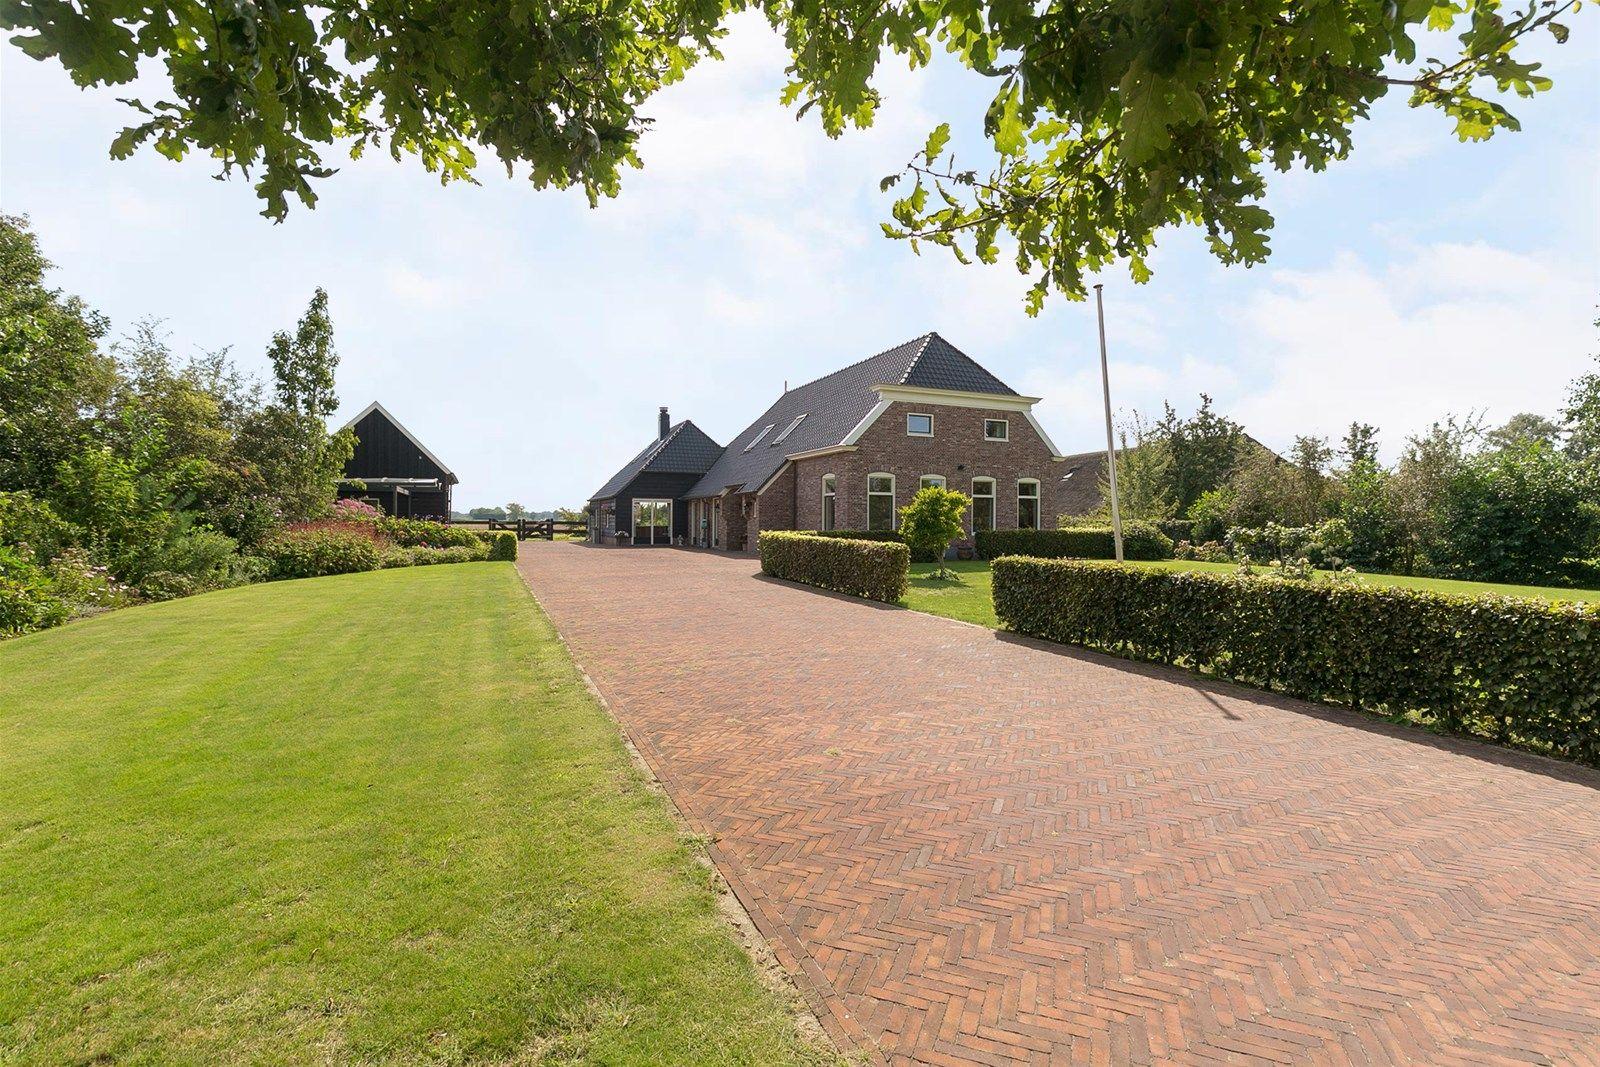 Wolddijk 34, Ruinerwold